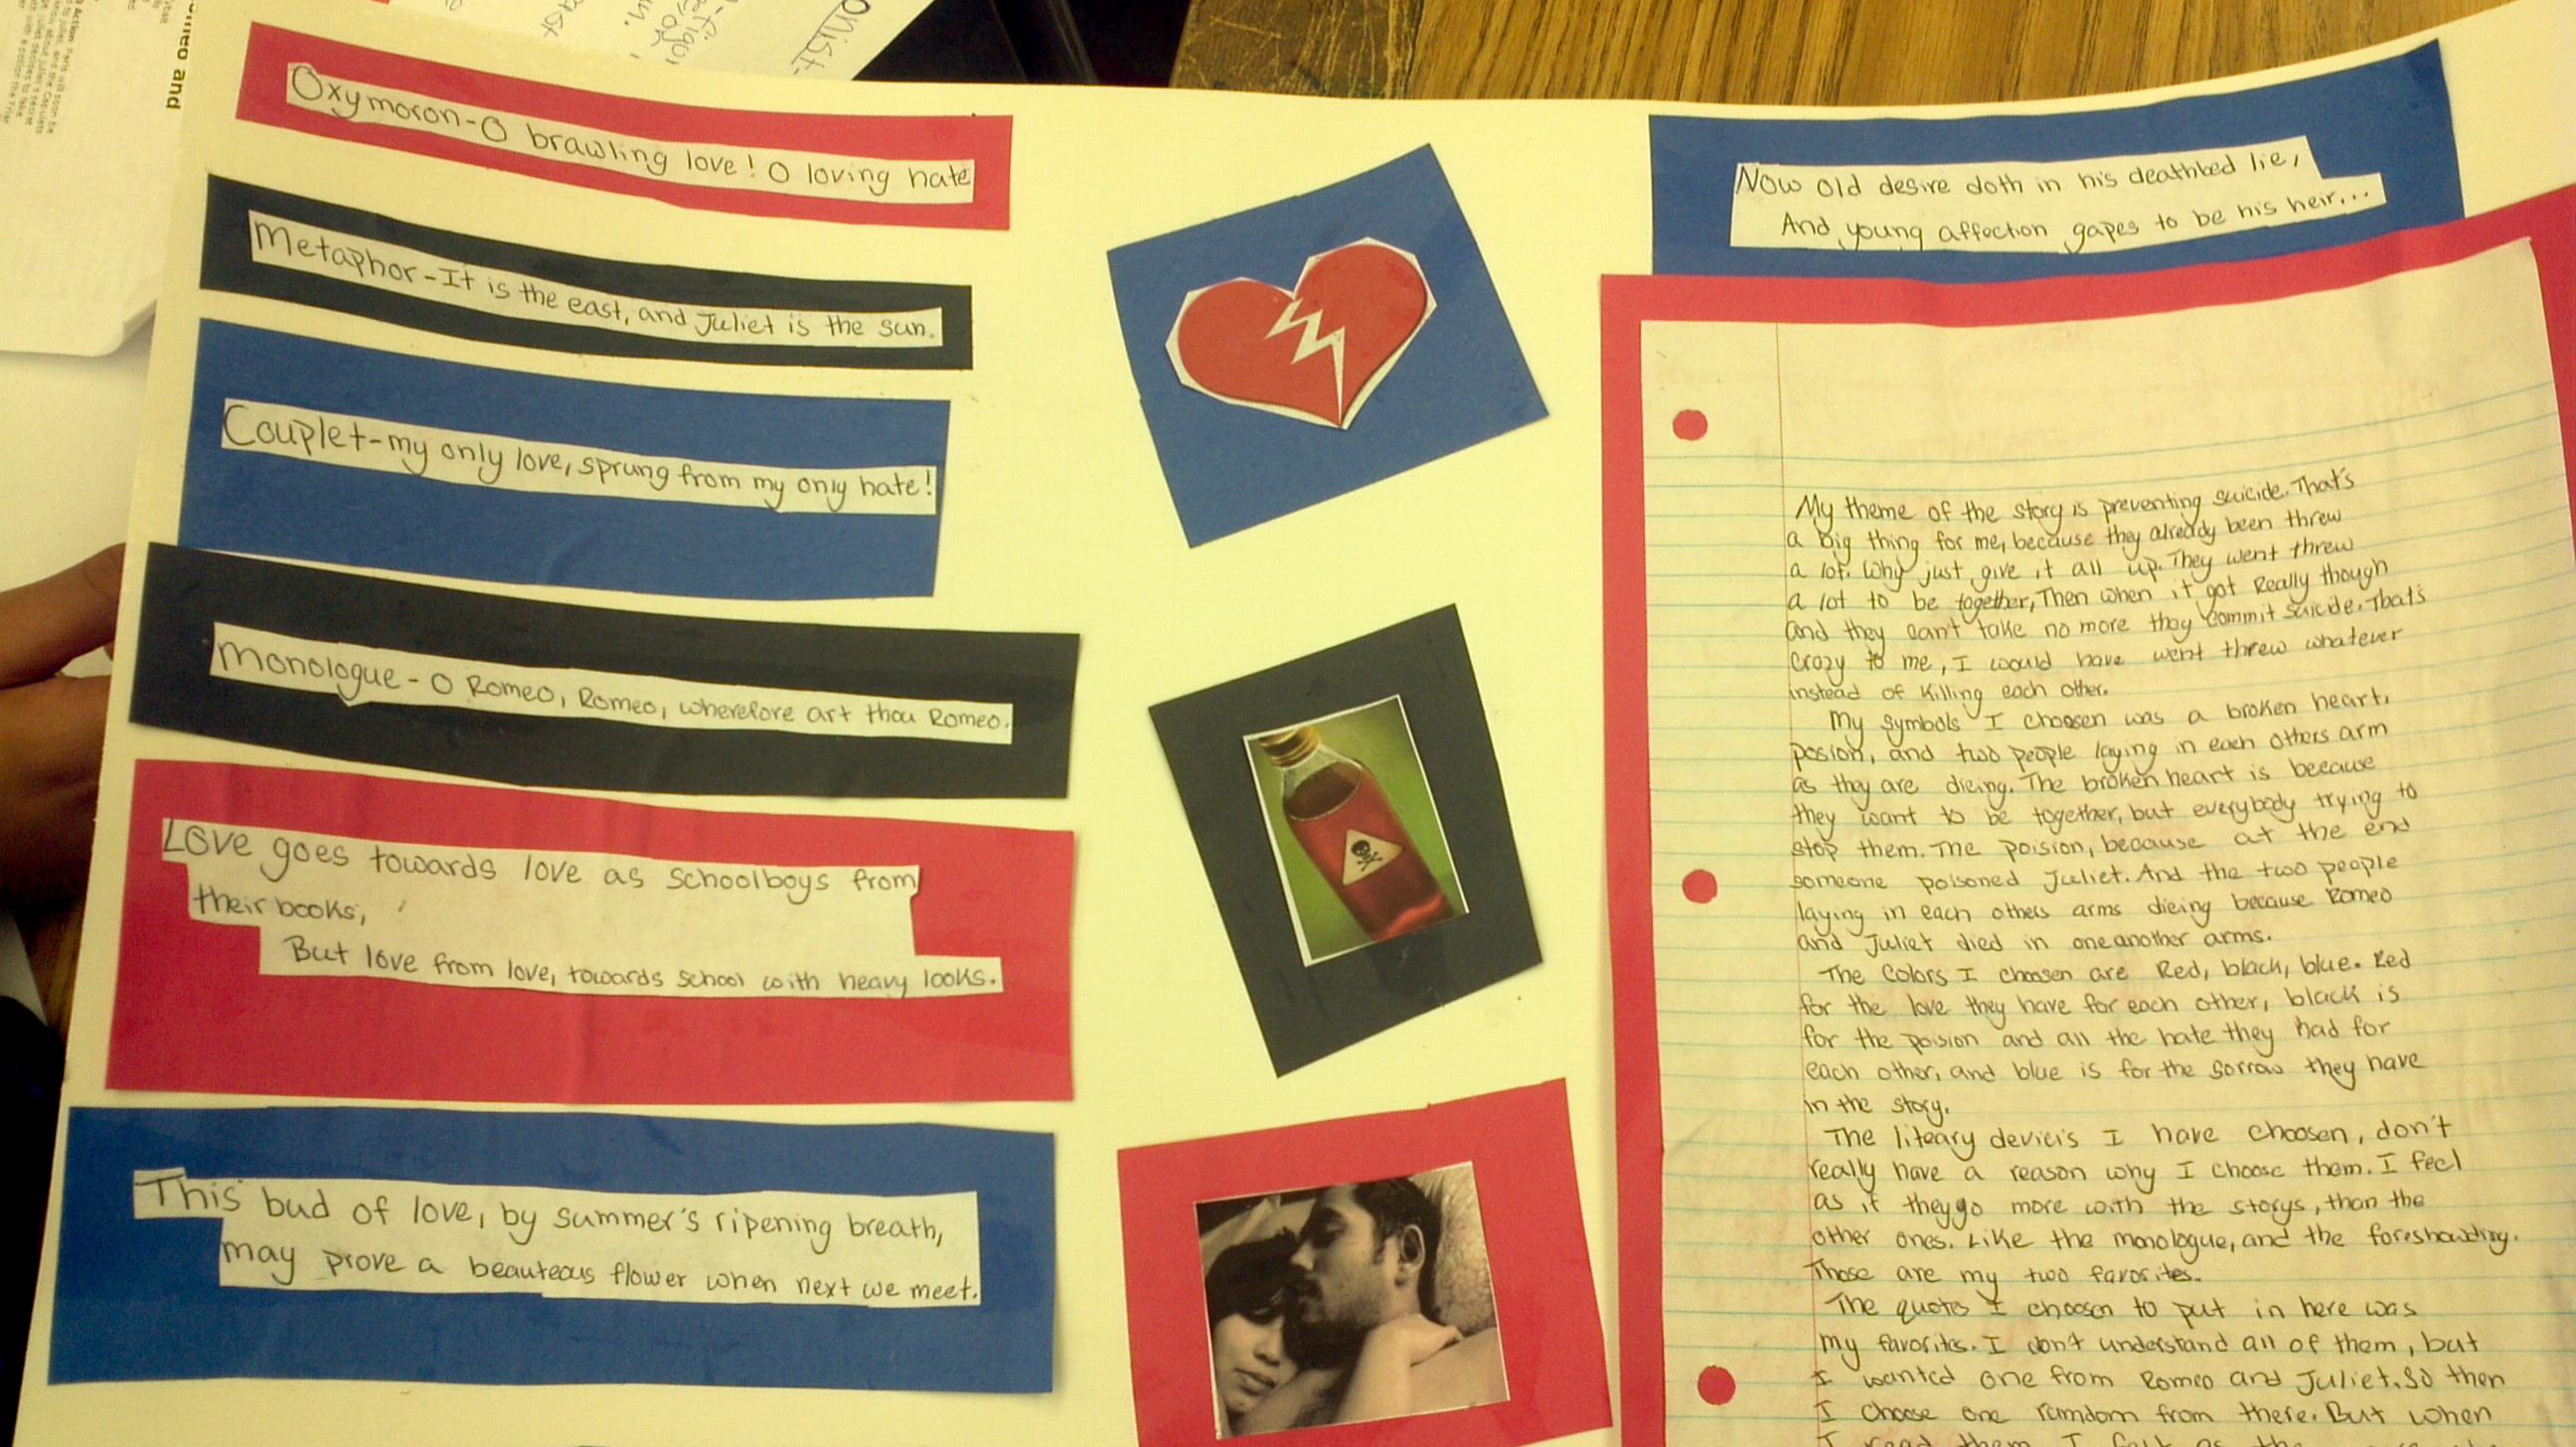 011 Essay Example Graphic Incredible Organizer Narrative Pdf Persuasive Middle School Literary 5th Grade Full